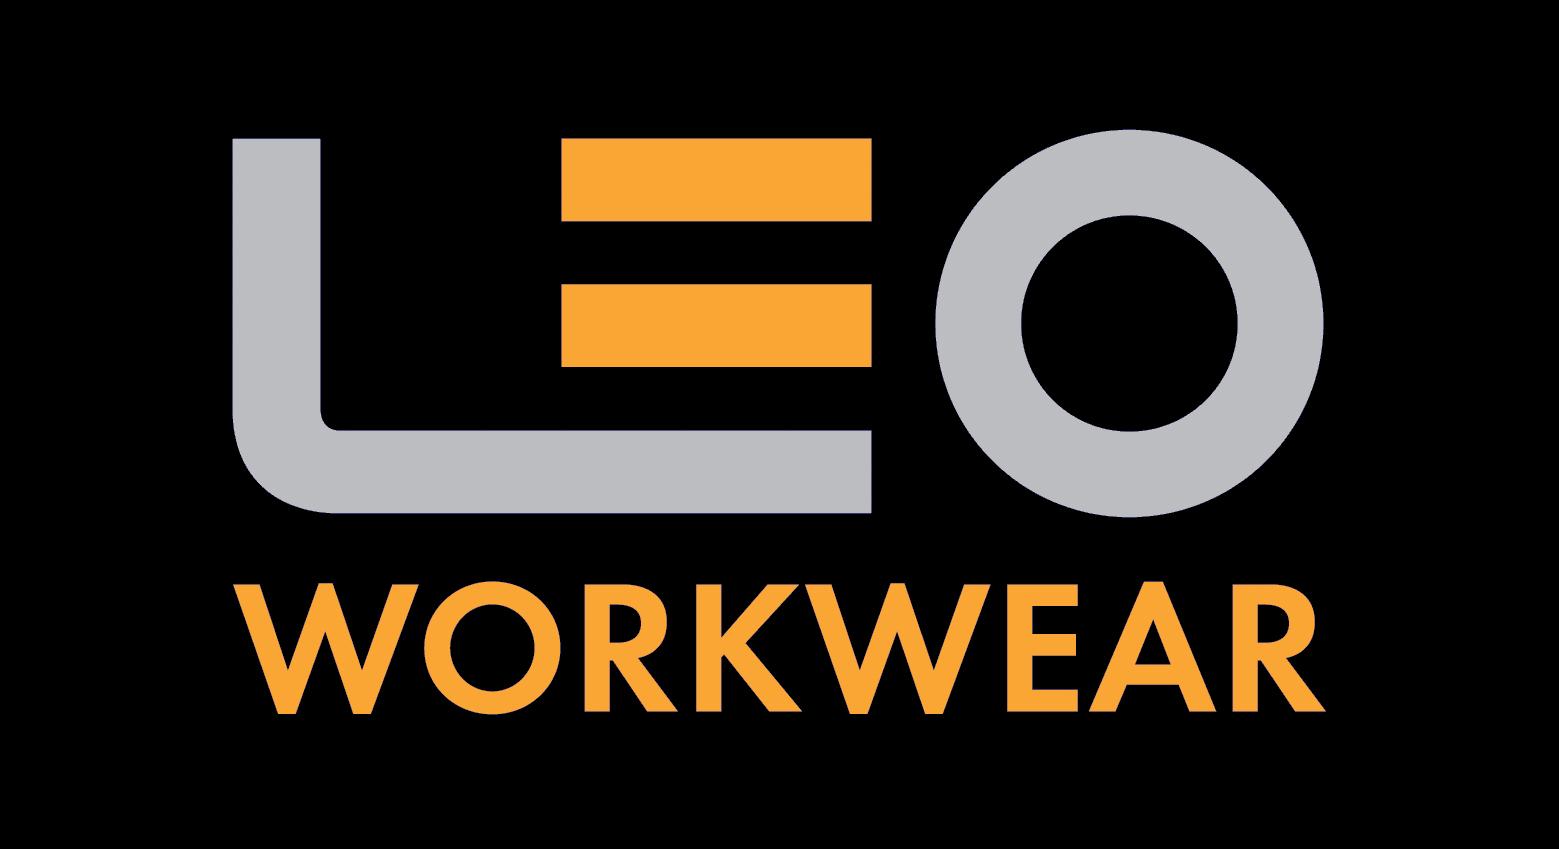 LEO_Logo_AW.indd